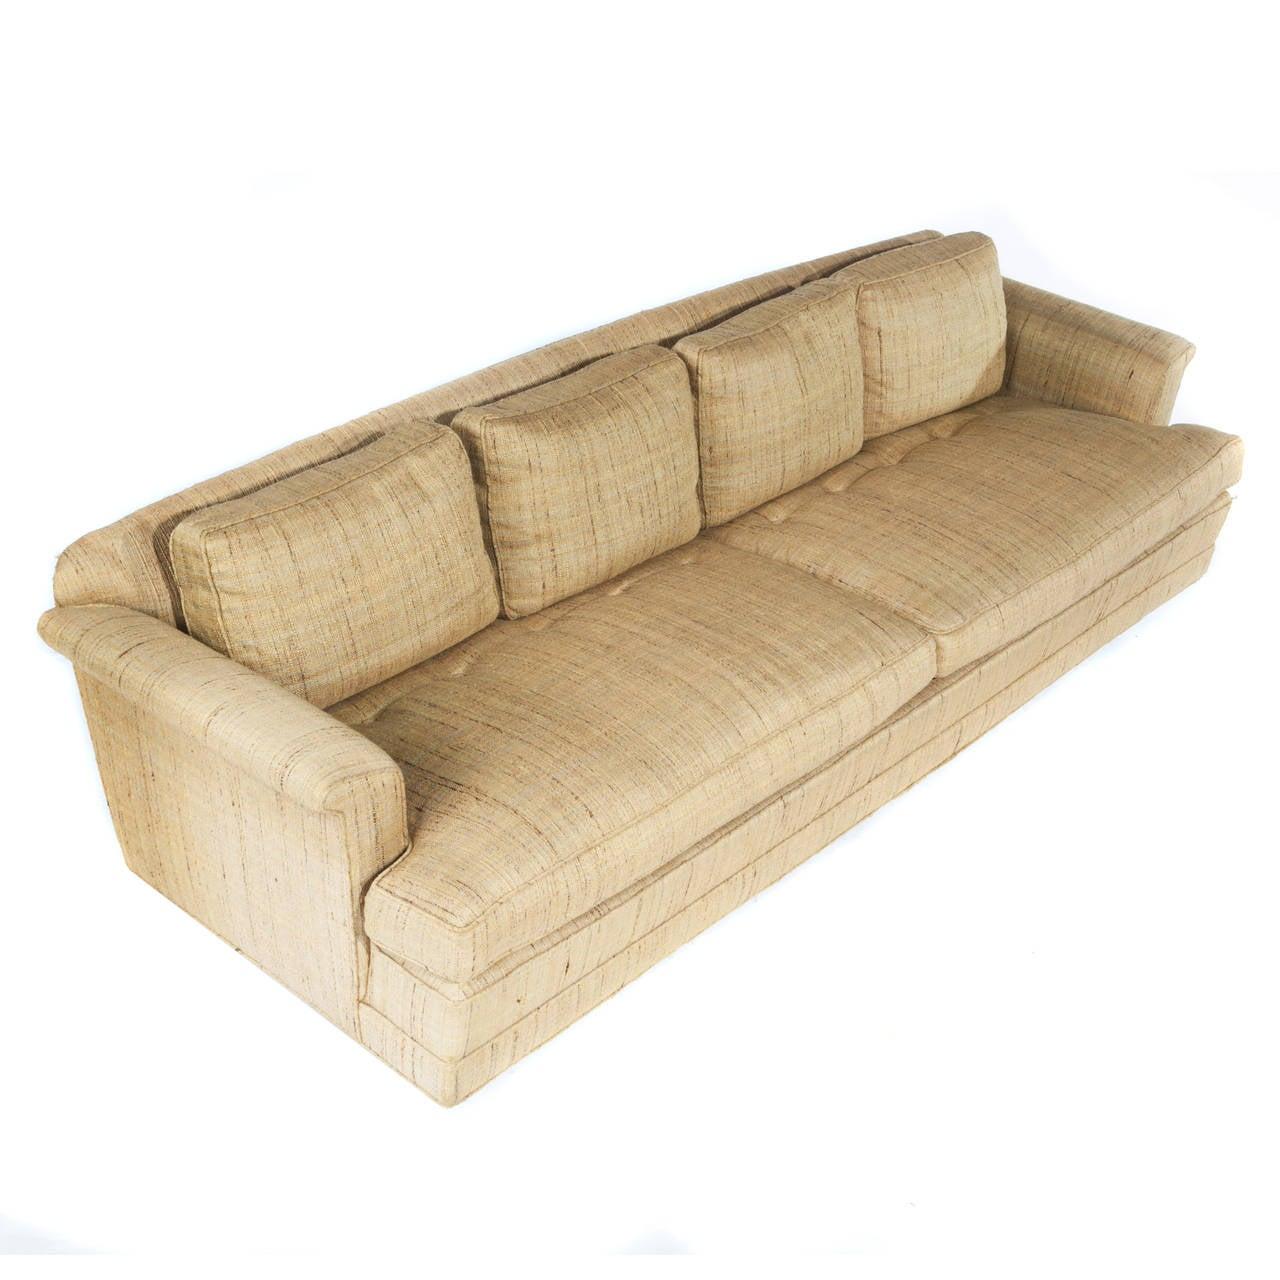 1950s Four-Seat Sofa by Edward Wormley for Dunbar 7